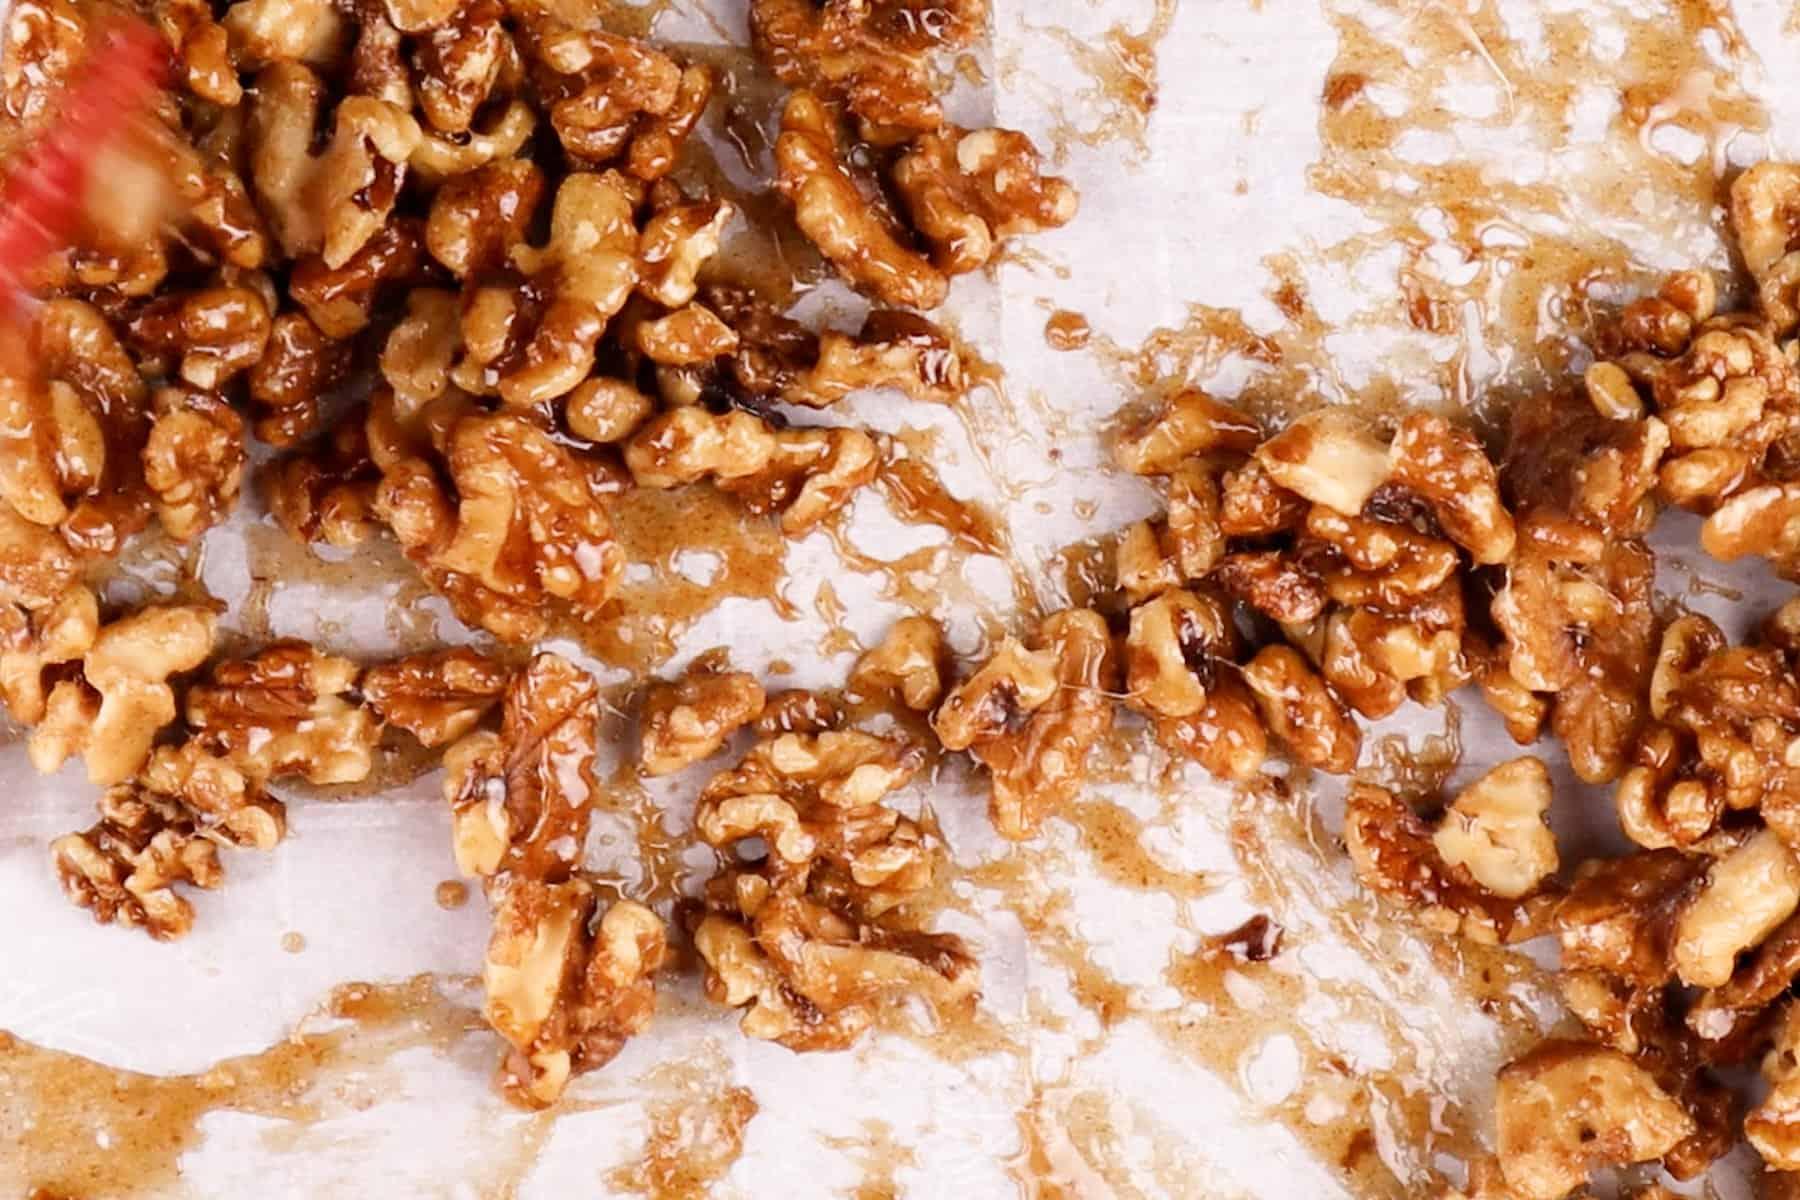 walnuts in bakings heet after baking halfway